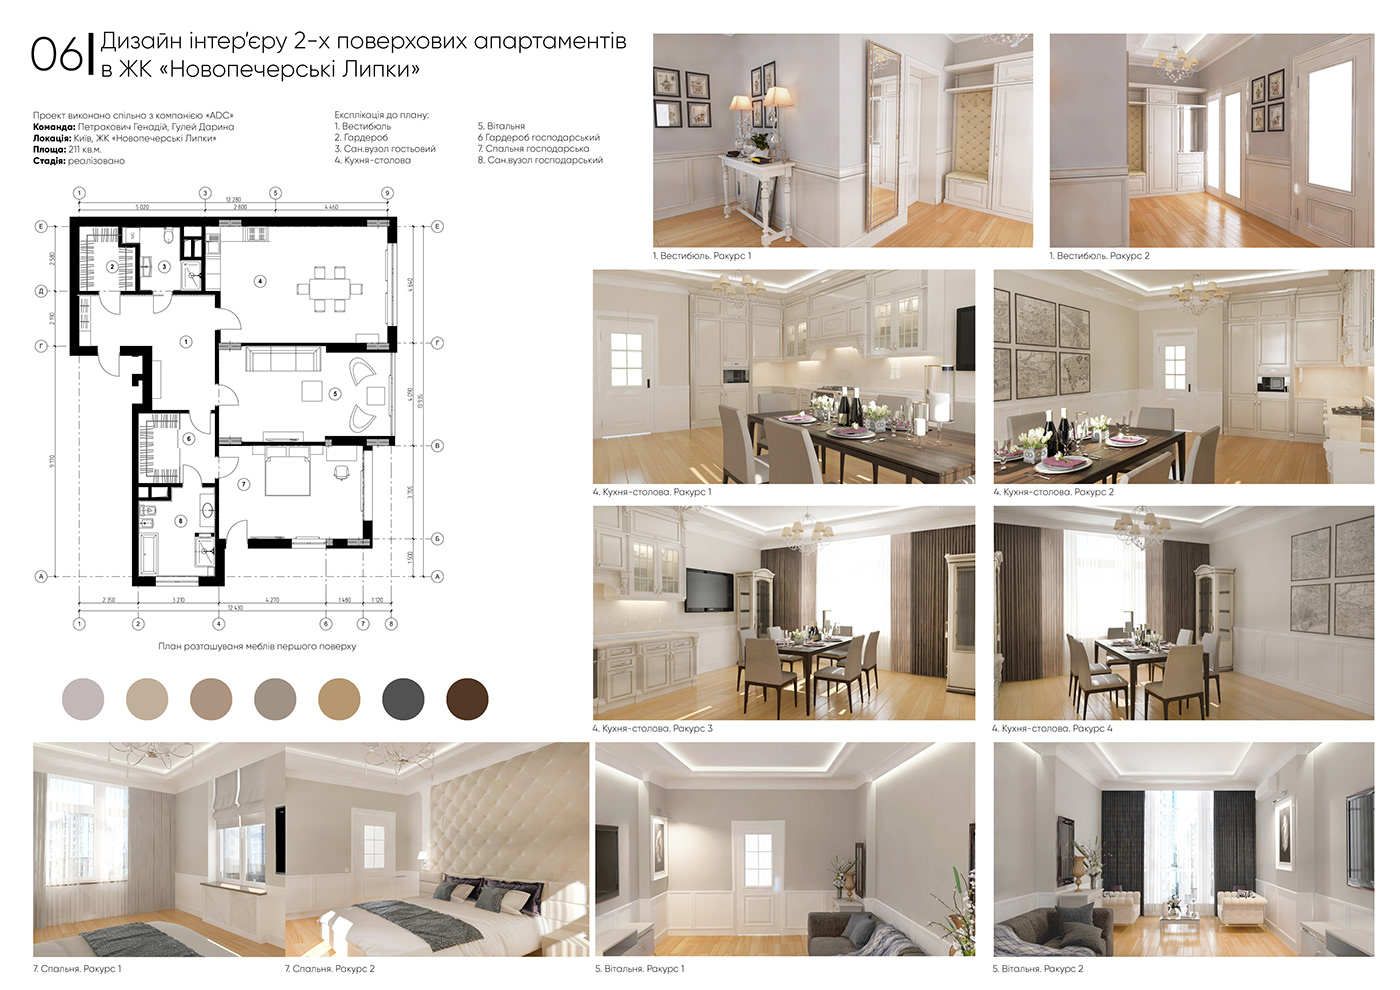 3dmax apartment ArchiCAD architecrute architect AutoCAD designer interiordesign luxury photoshop